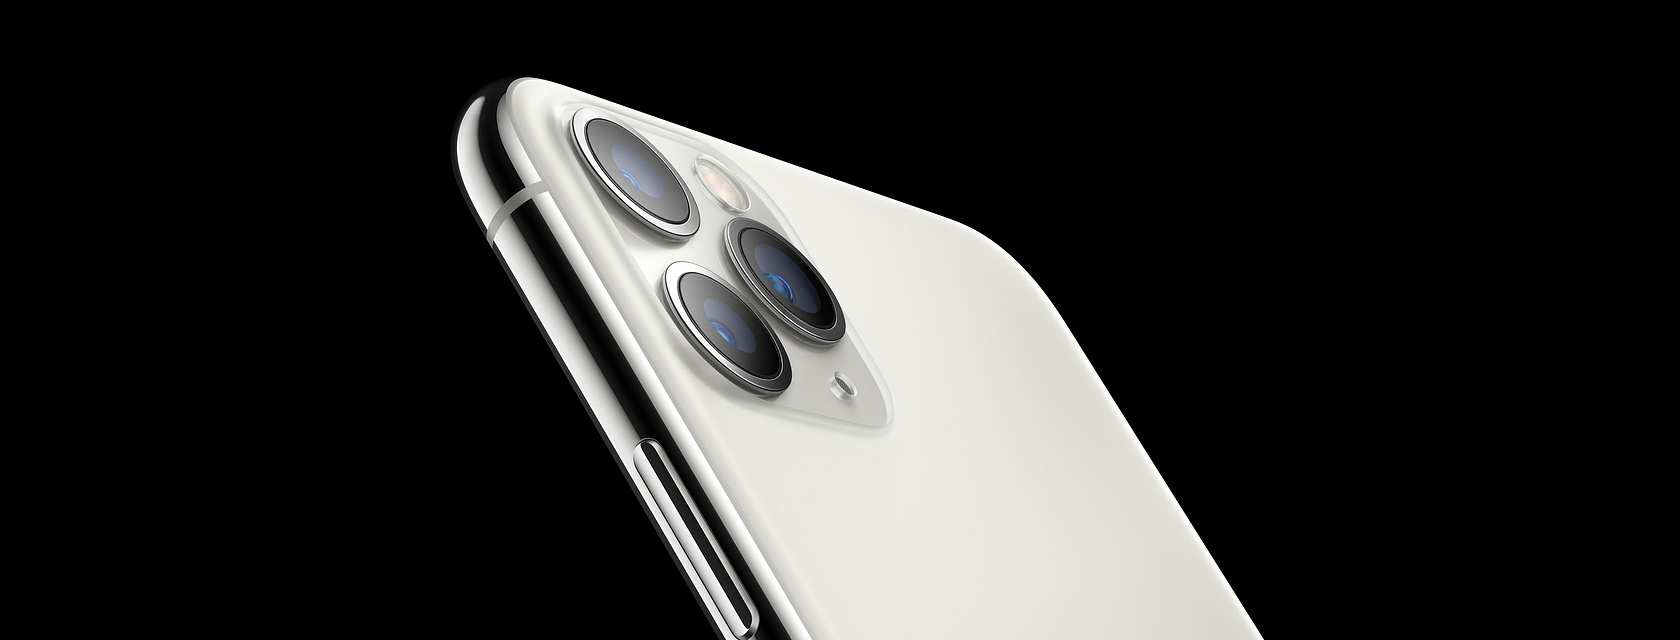 айфон 11 про 512 серебристый